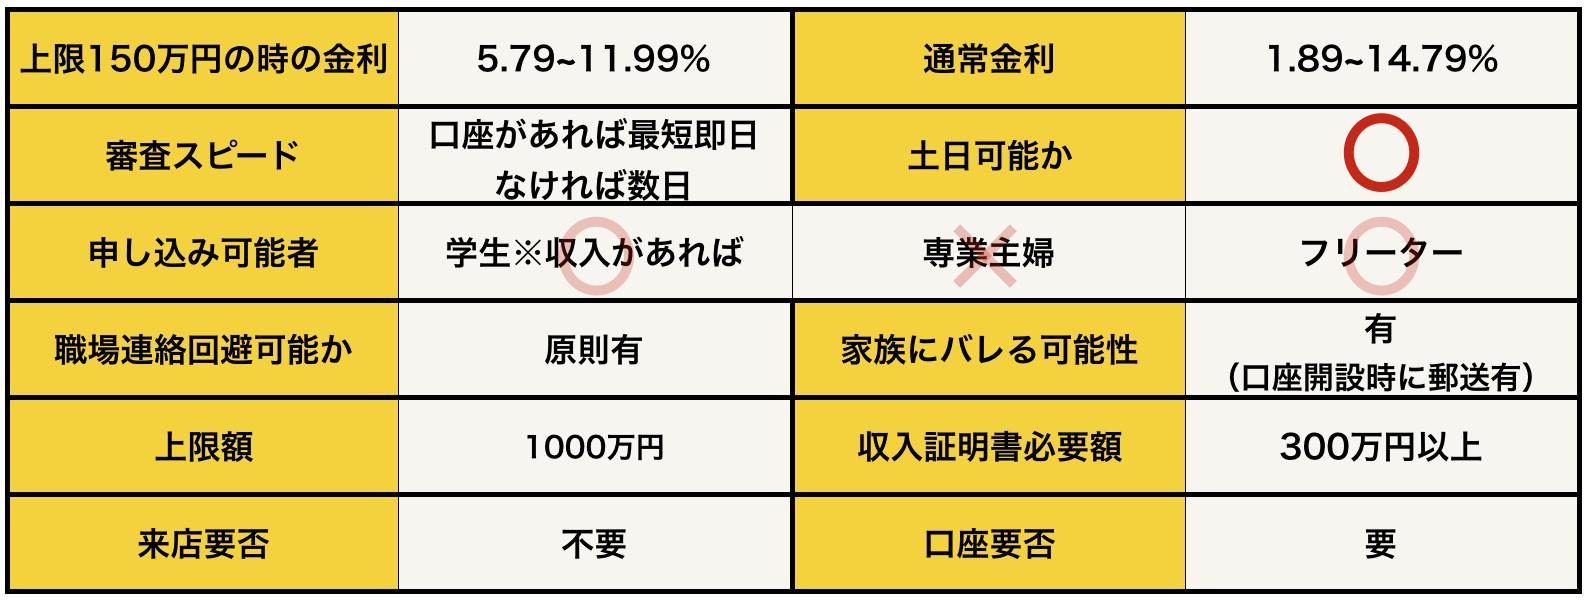 %e3%82%b9%e3%82%af%e3%83%aa%e3%83%bc%e3%83%b3%e3%82%b7%e3%83%a7%e3%83%83%e3%83%88-2016-10-24-20-44-01